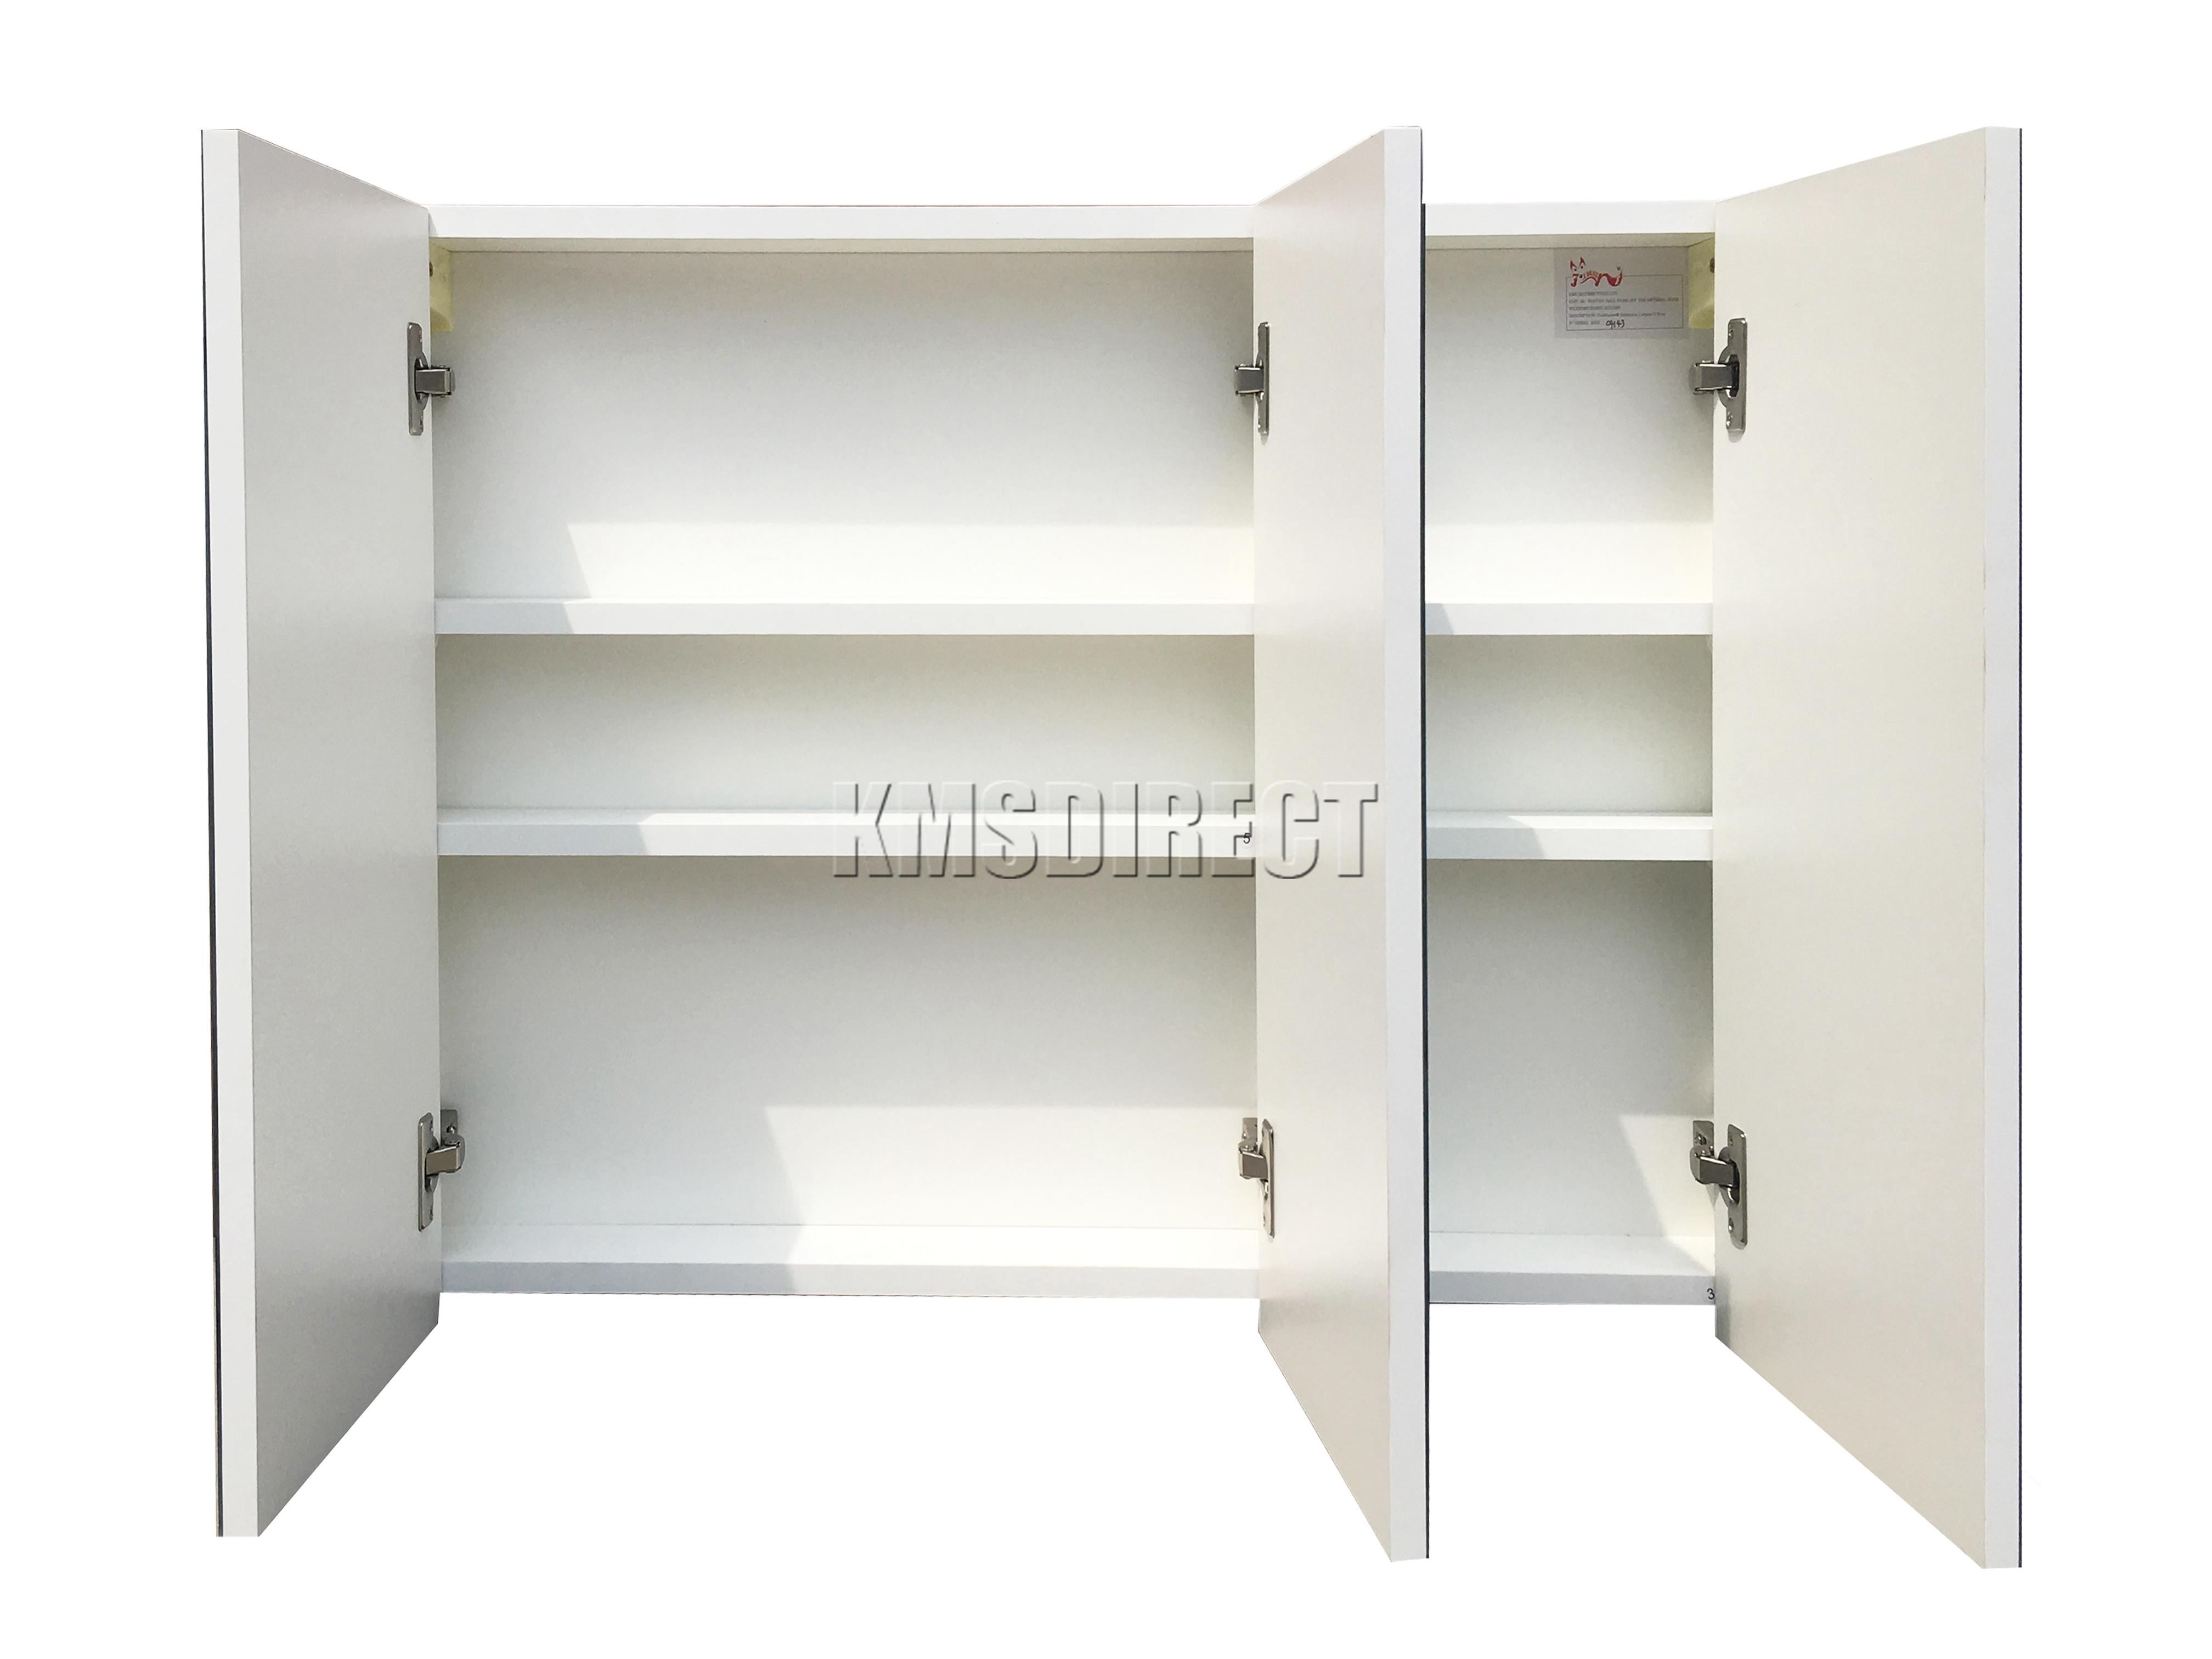 foxhunter wall mount mirror bathroom cabinet unit storage. Black Bedroom Furniture Sets. Home Design Ideas